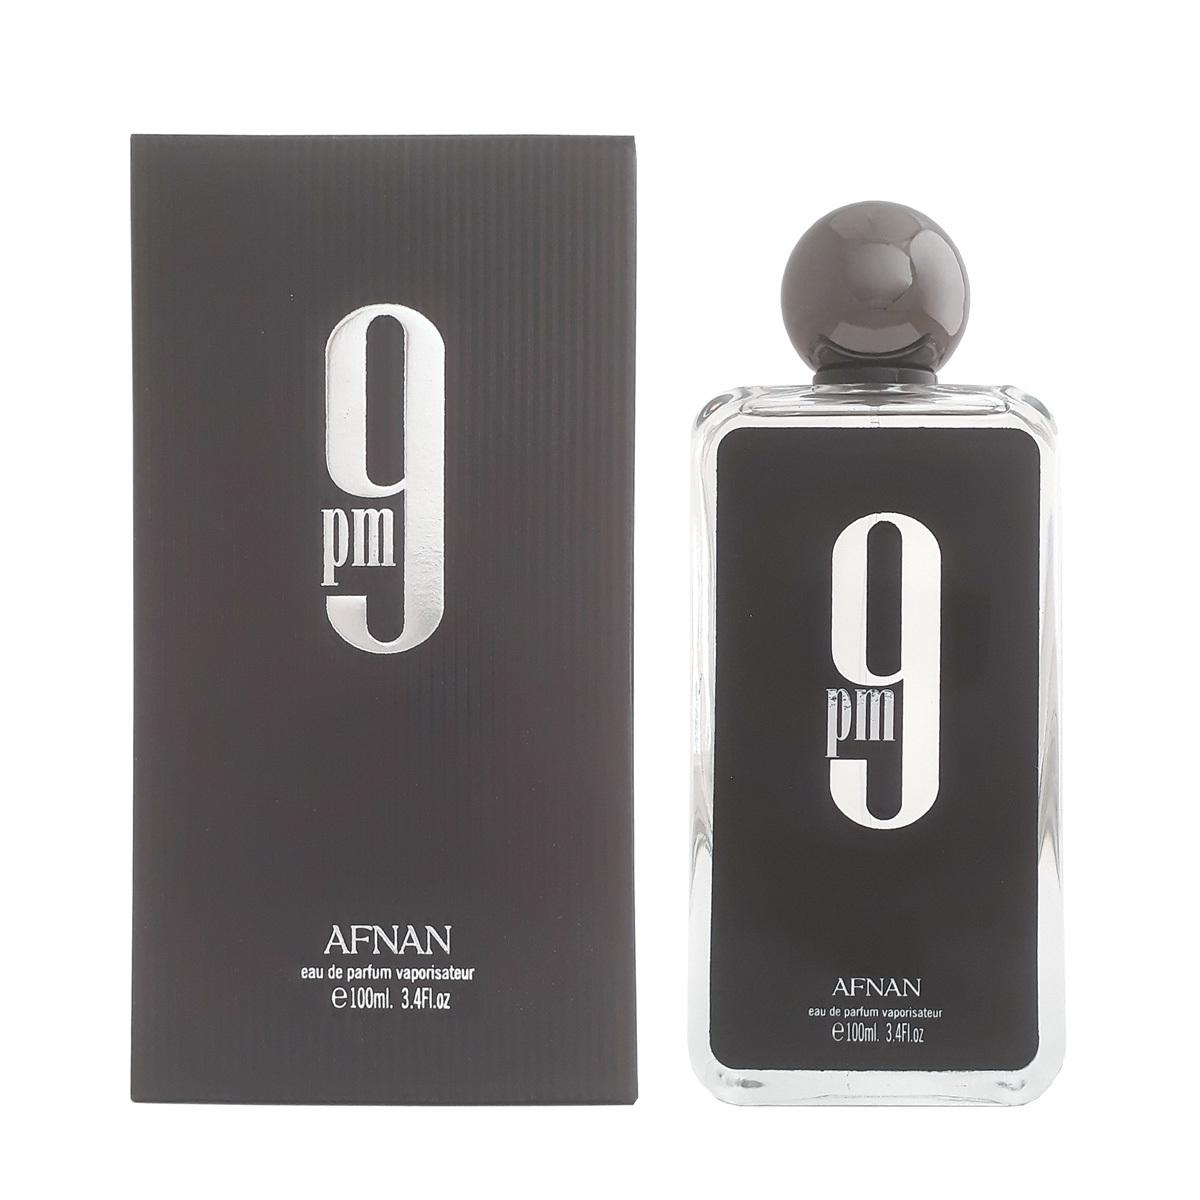 9 PM u EDP 100 ML спрей от Афнан Парфюм Afnan Perfumes